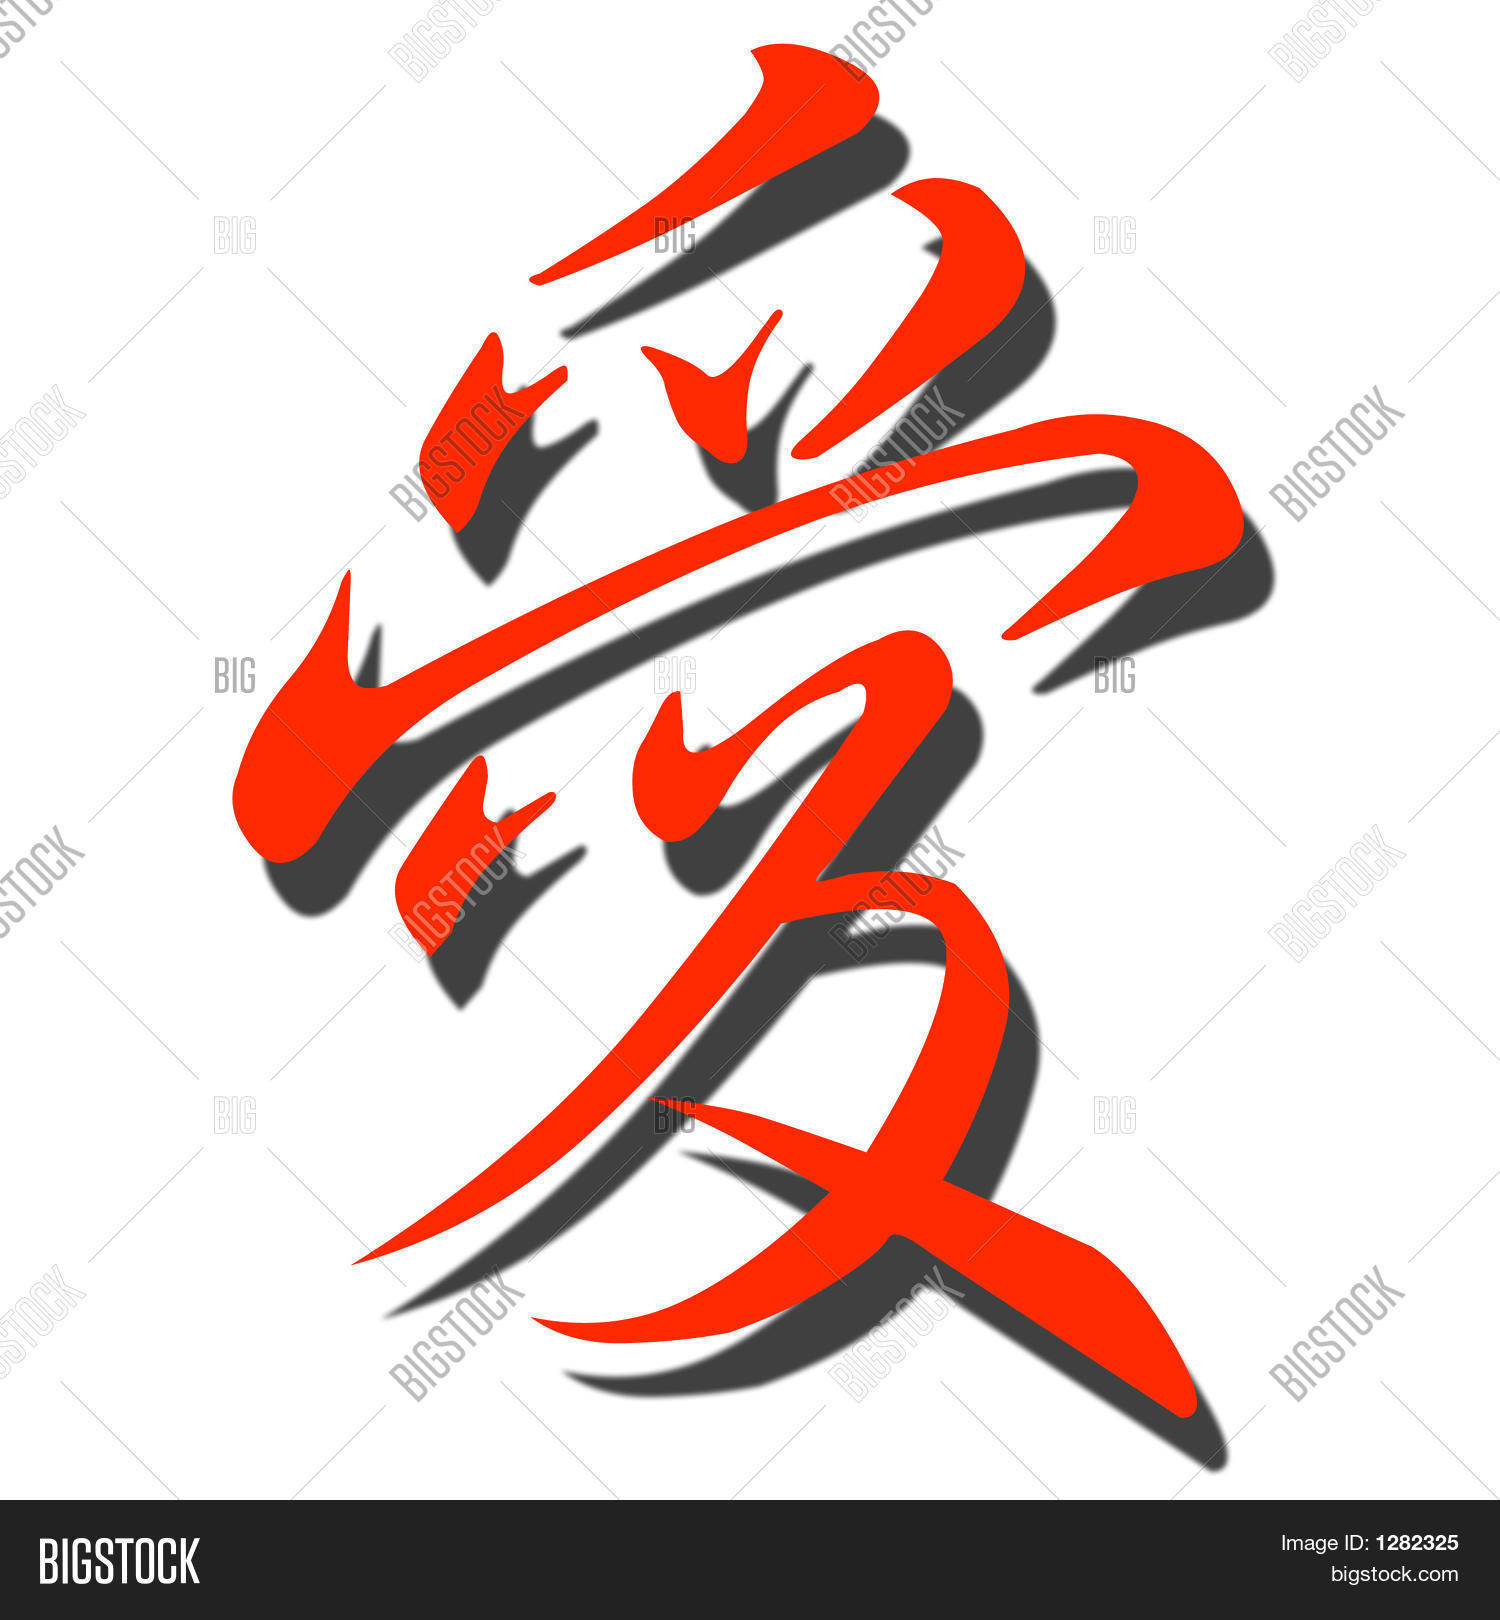 Chinese Symbol Love Image Photo Free Trial Bigstock